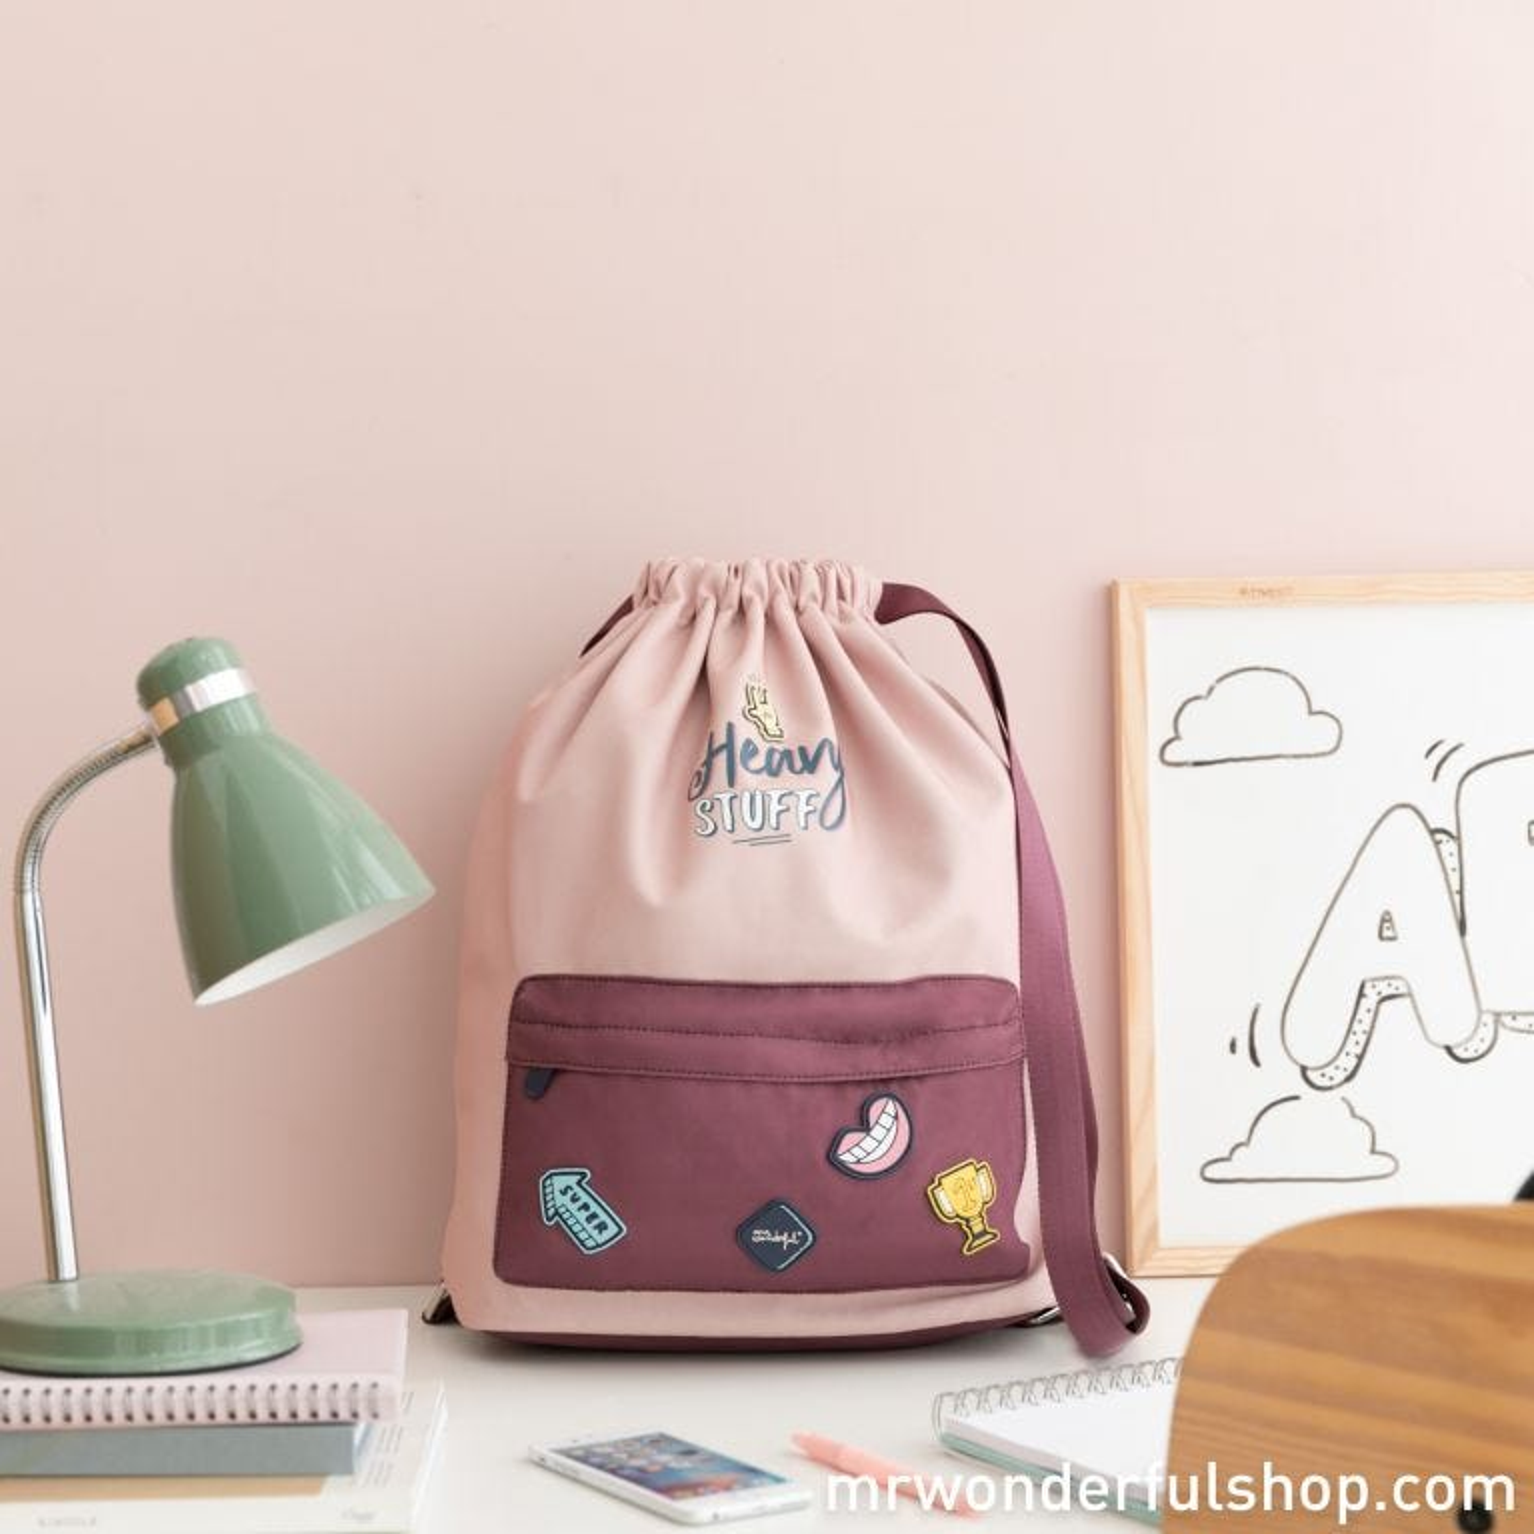 Sack bag - Heavy stuff